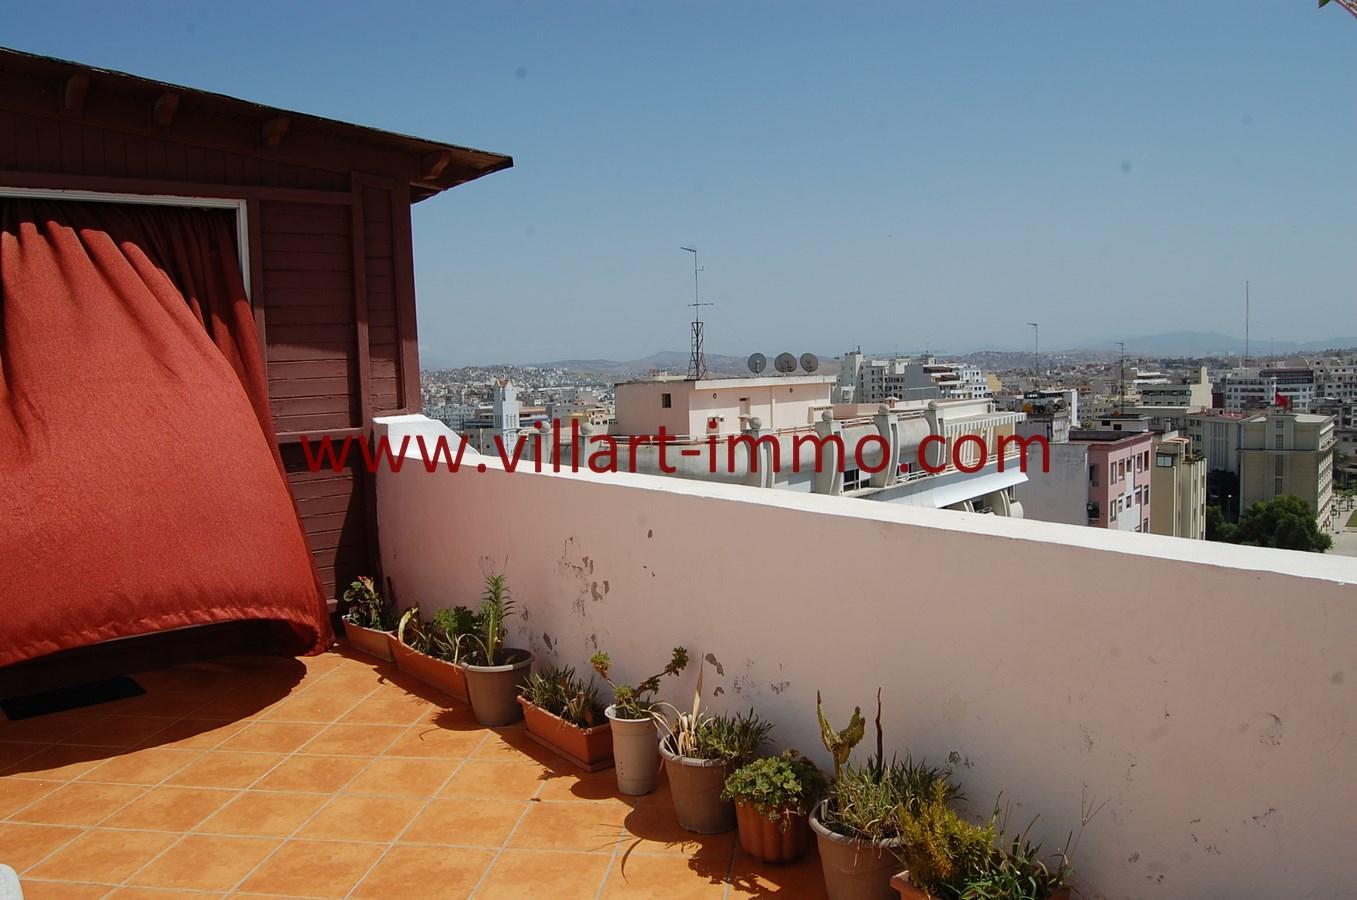 1-Vente-Appartement-Tanger-Centre-Ville-Terrasse 1-VA505-Villart Immo